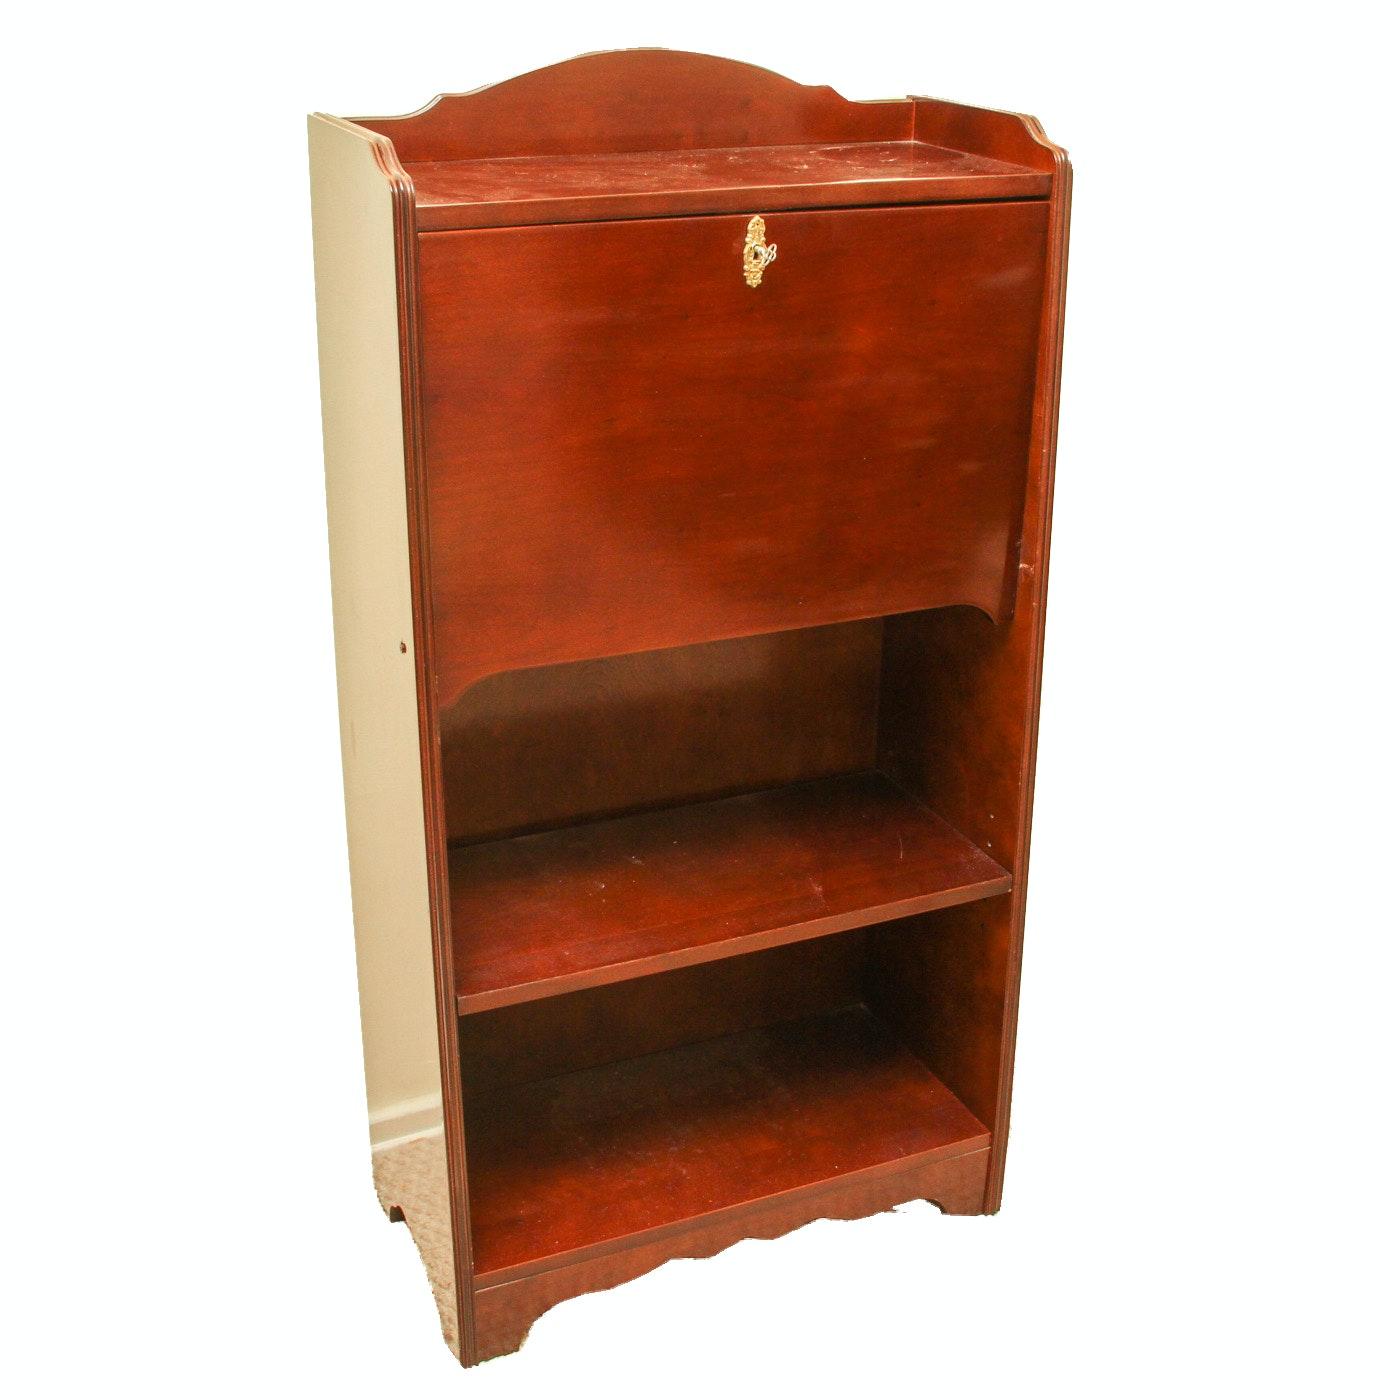 Vintage Wood Secretary Desk and Bookcase